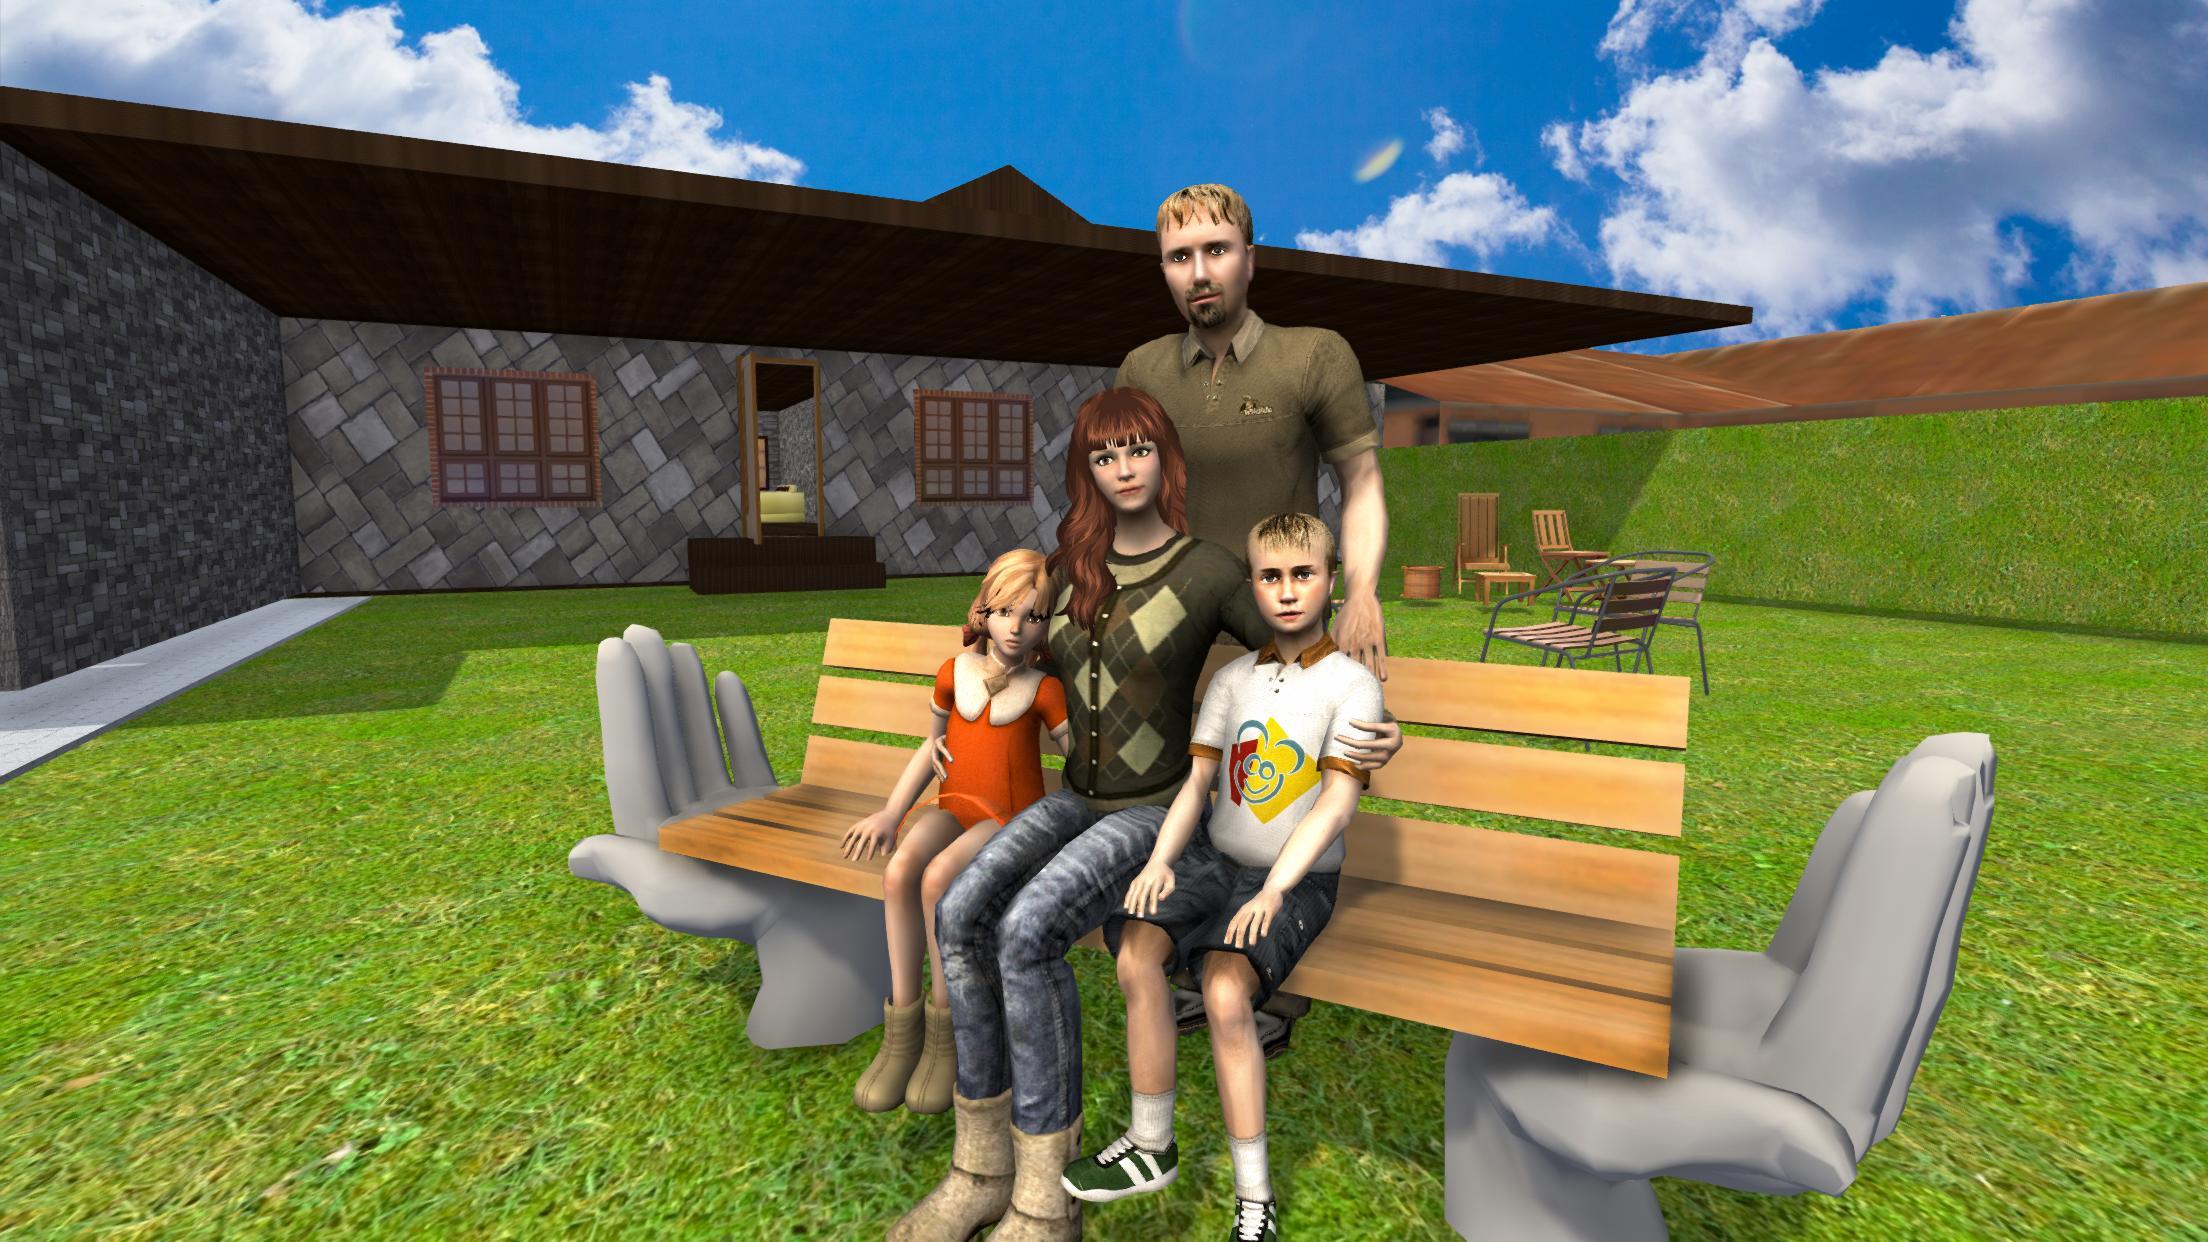 Картинка виртуальная семья